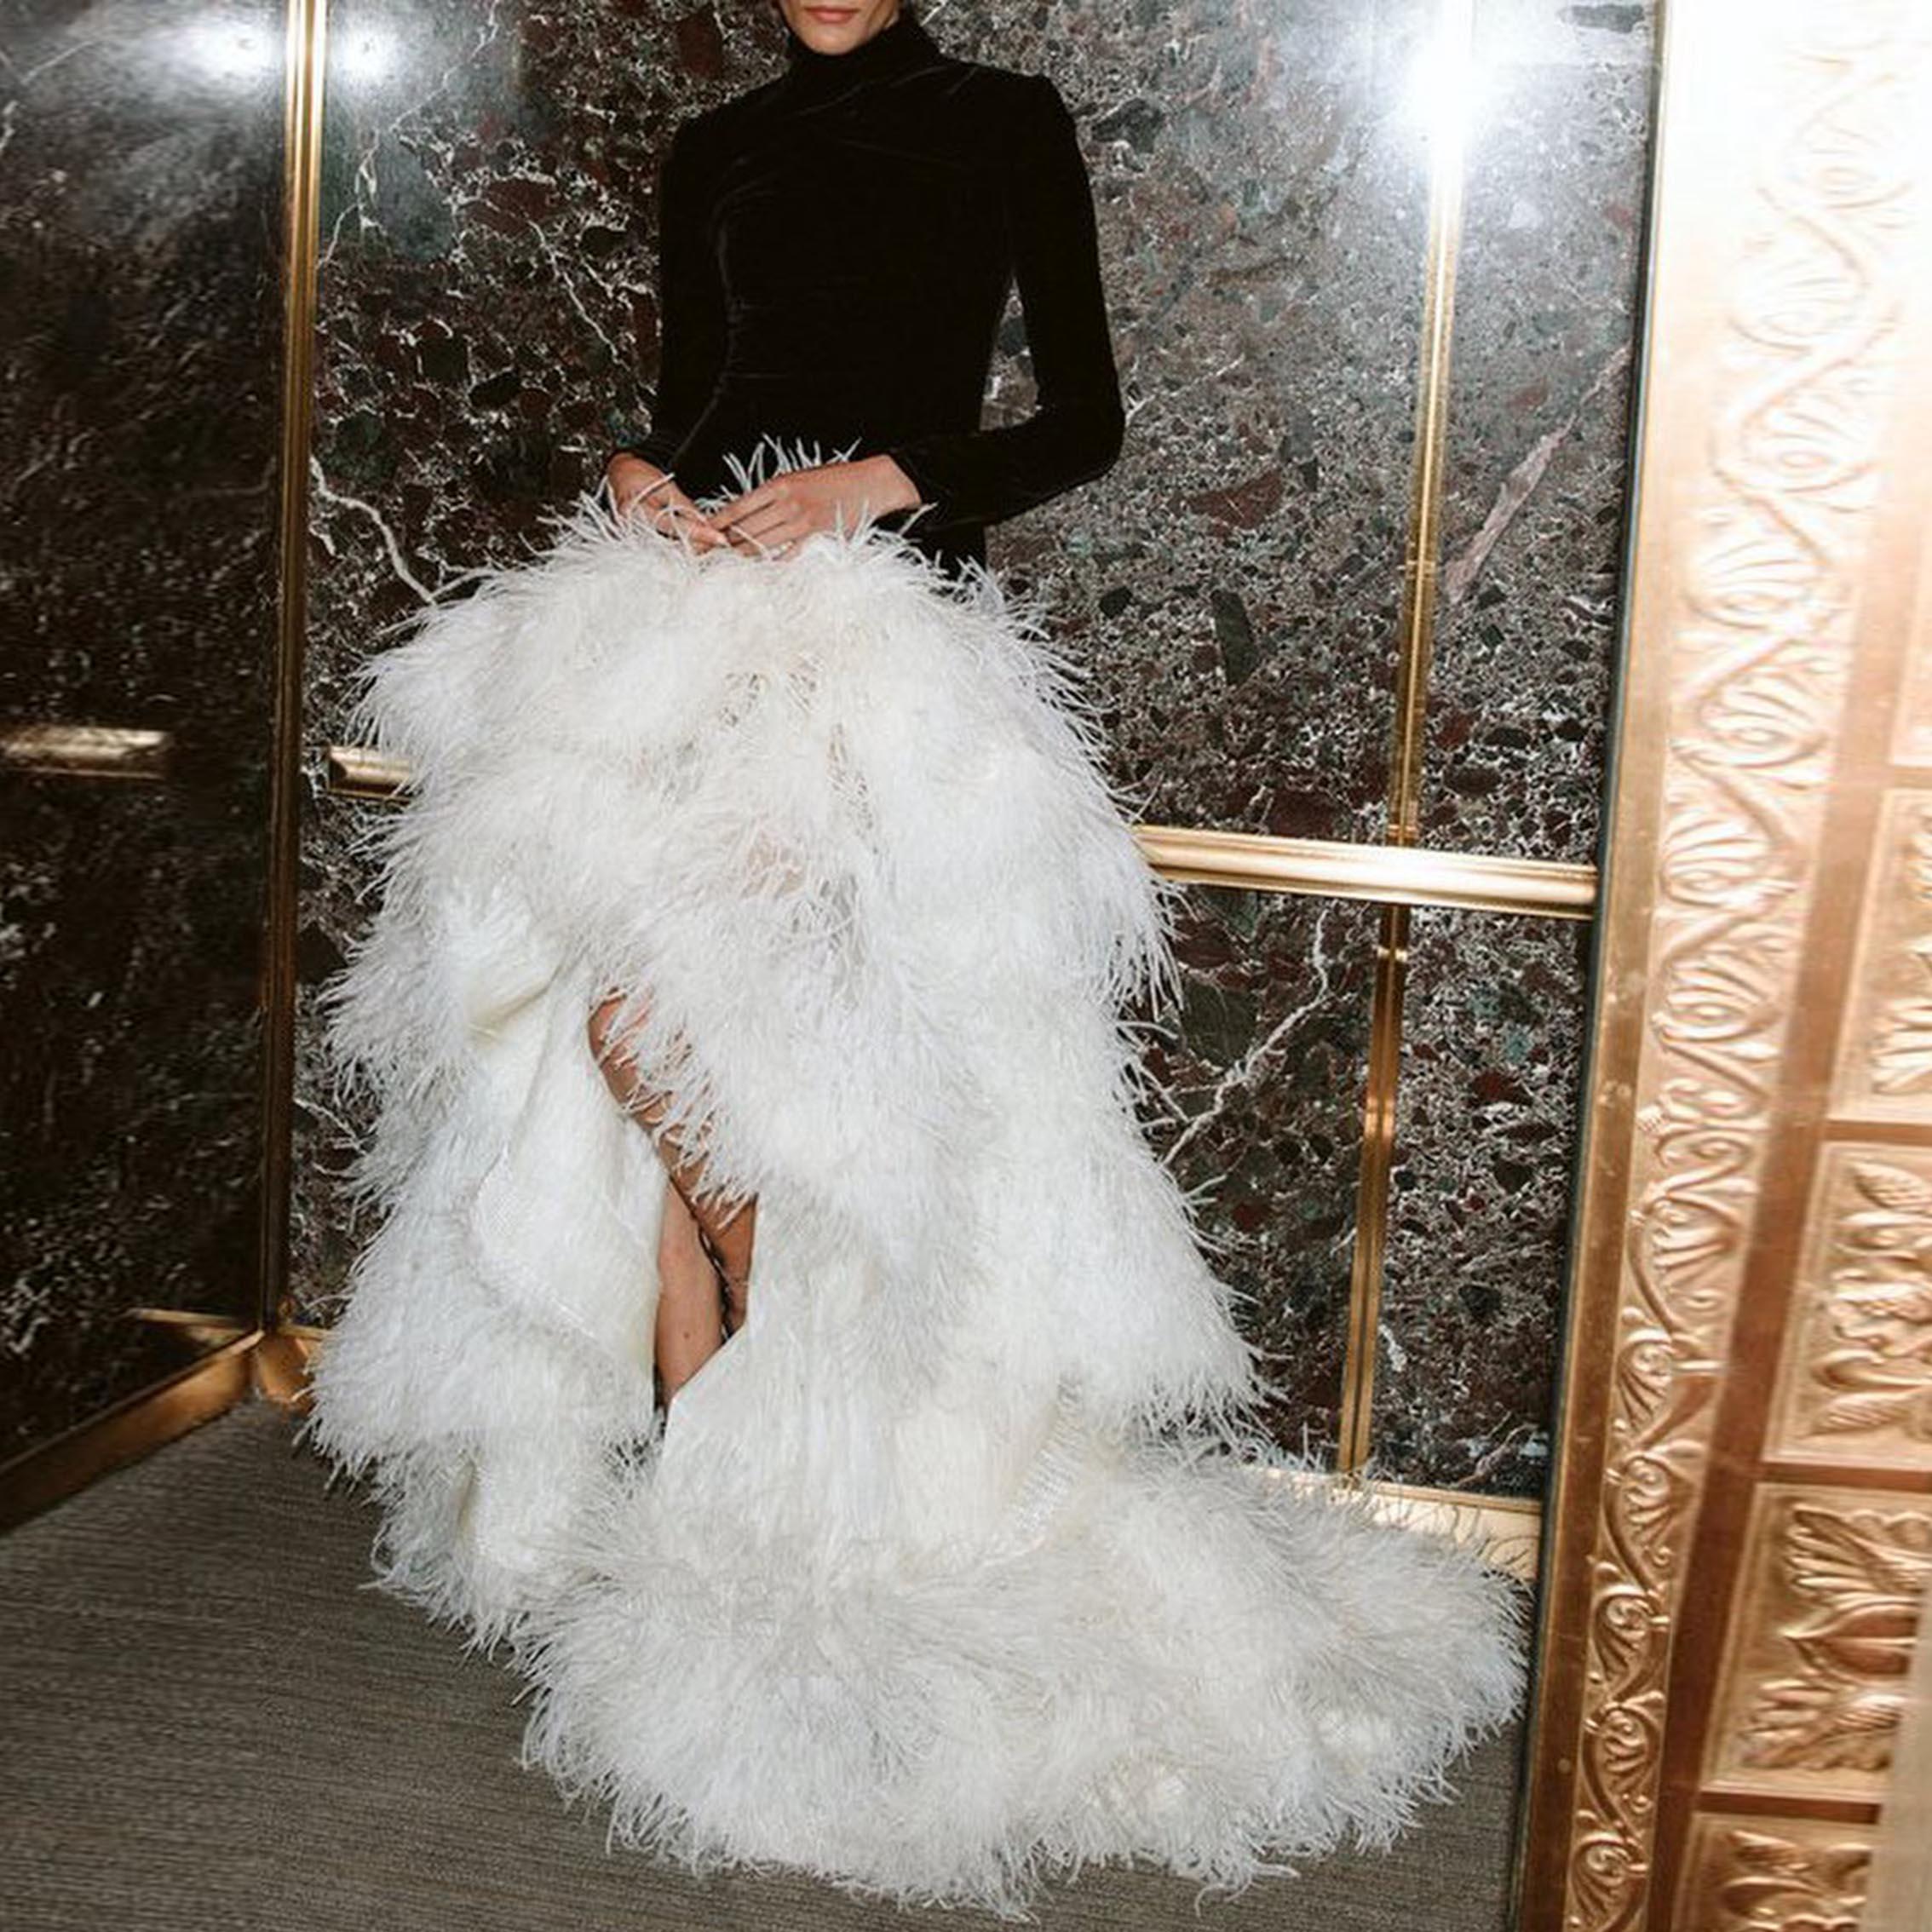 High Waist Feather Skirt High Low Formal Skirt Lush Ruffles Skirt White Ball Gown Layer Skirt With Train Evening Skirts